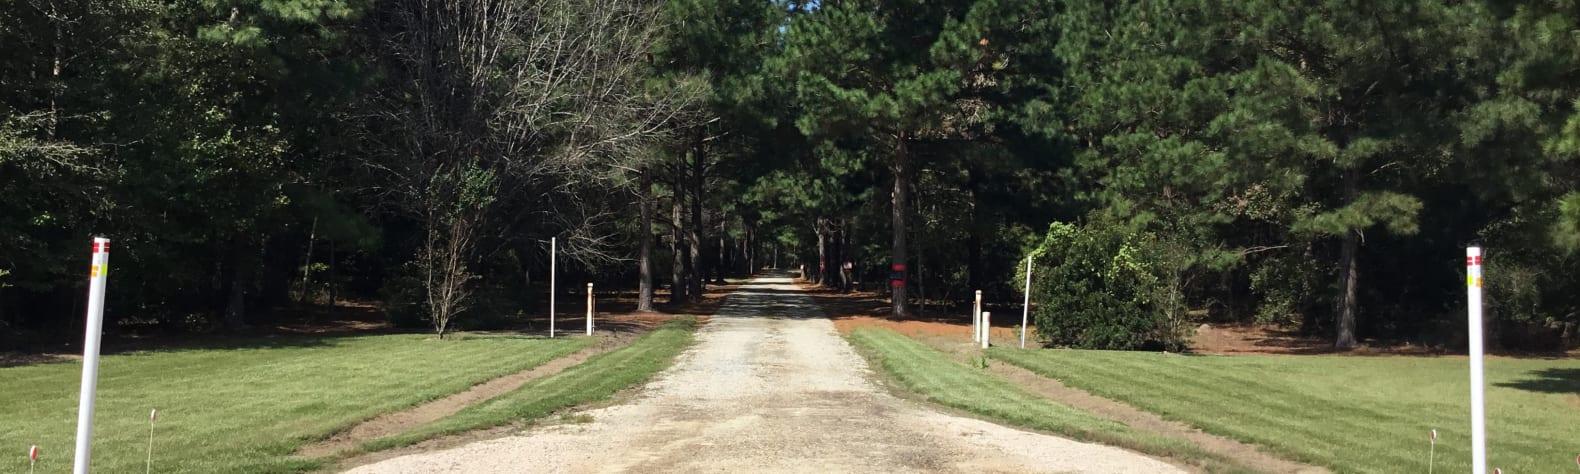 Cedar Creek Campground